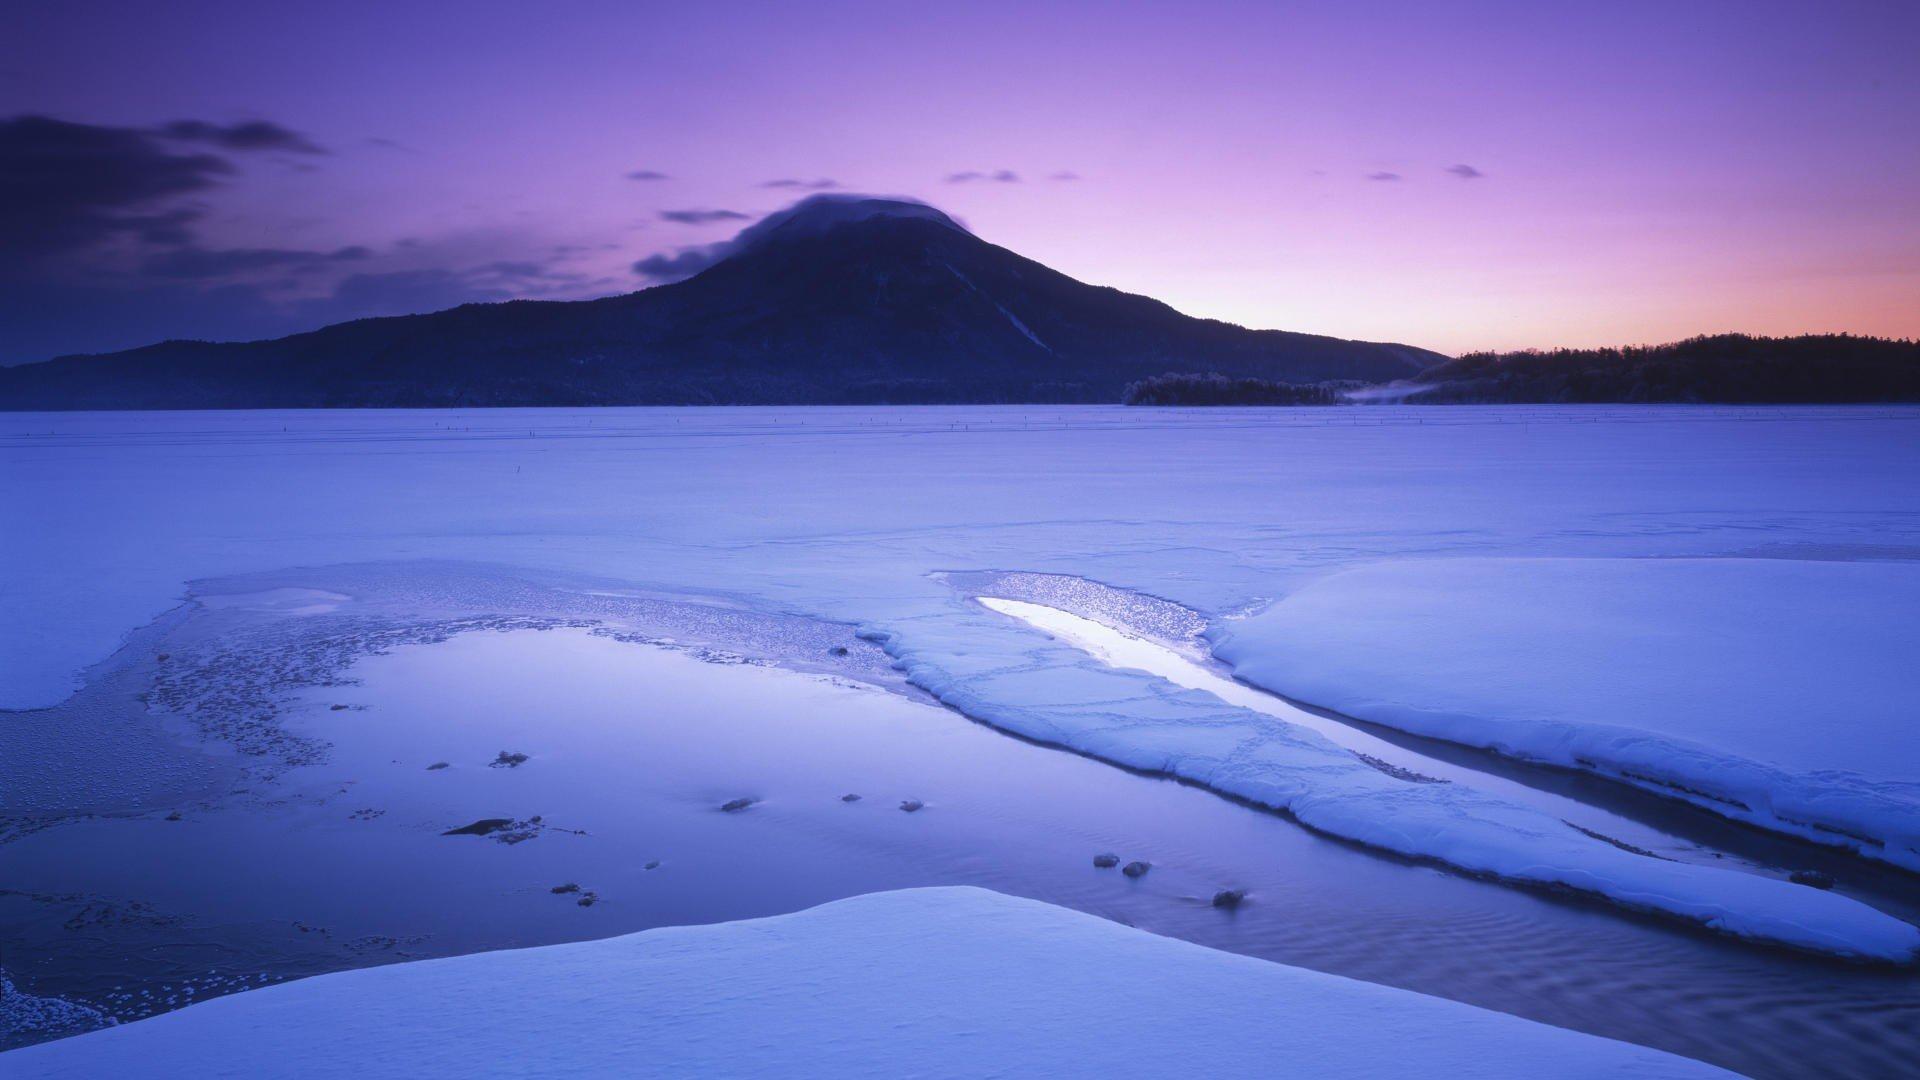 Japan winter National Park Hokkaido wallpaper | 1920x1080 ...